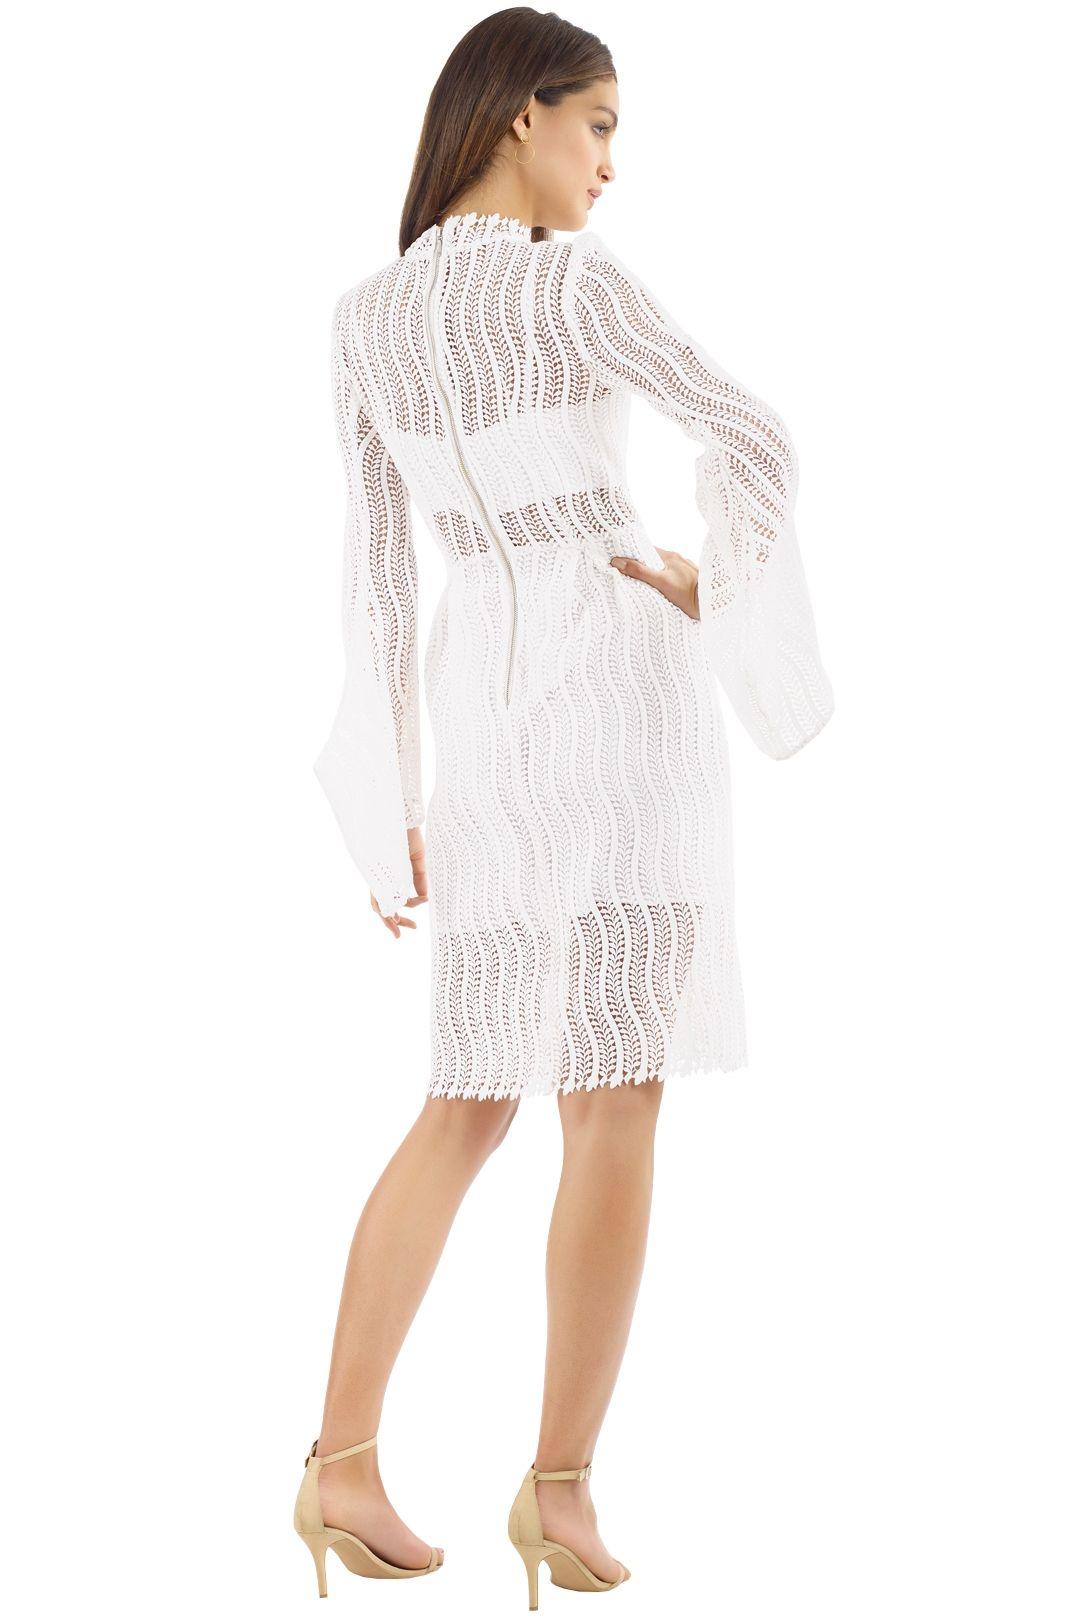 Yeojin Bae - Caterina Dress - Cream - Back